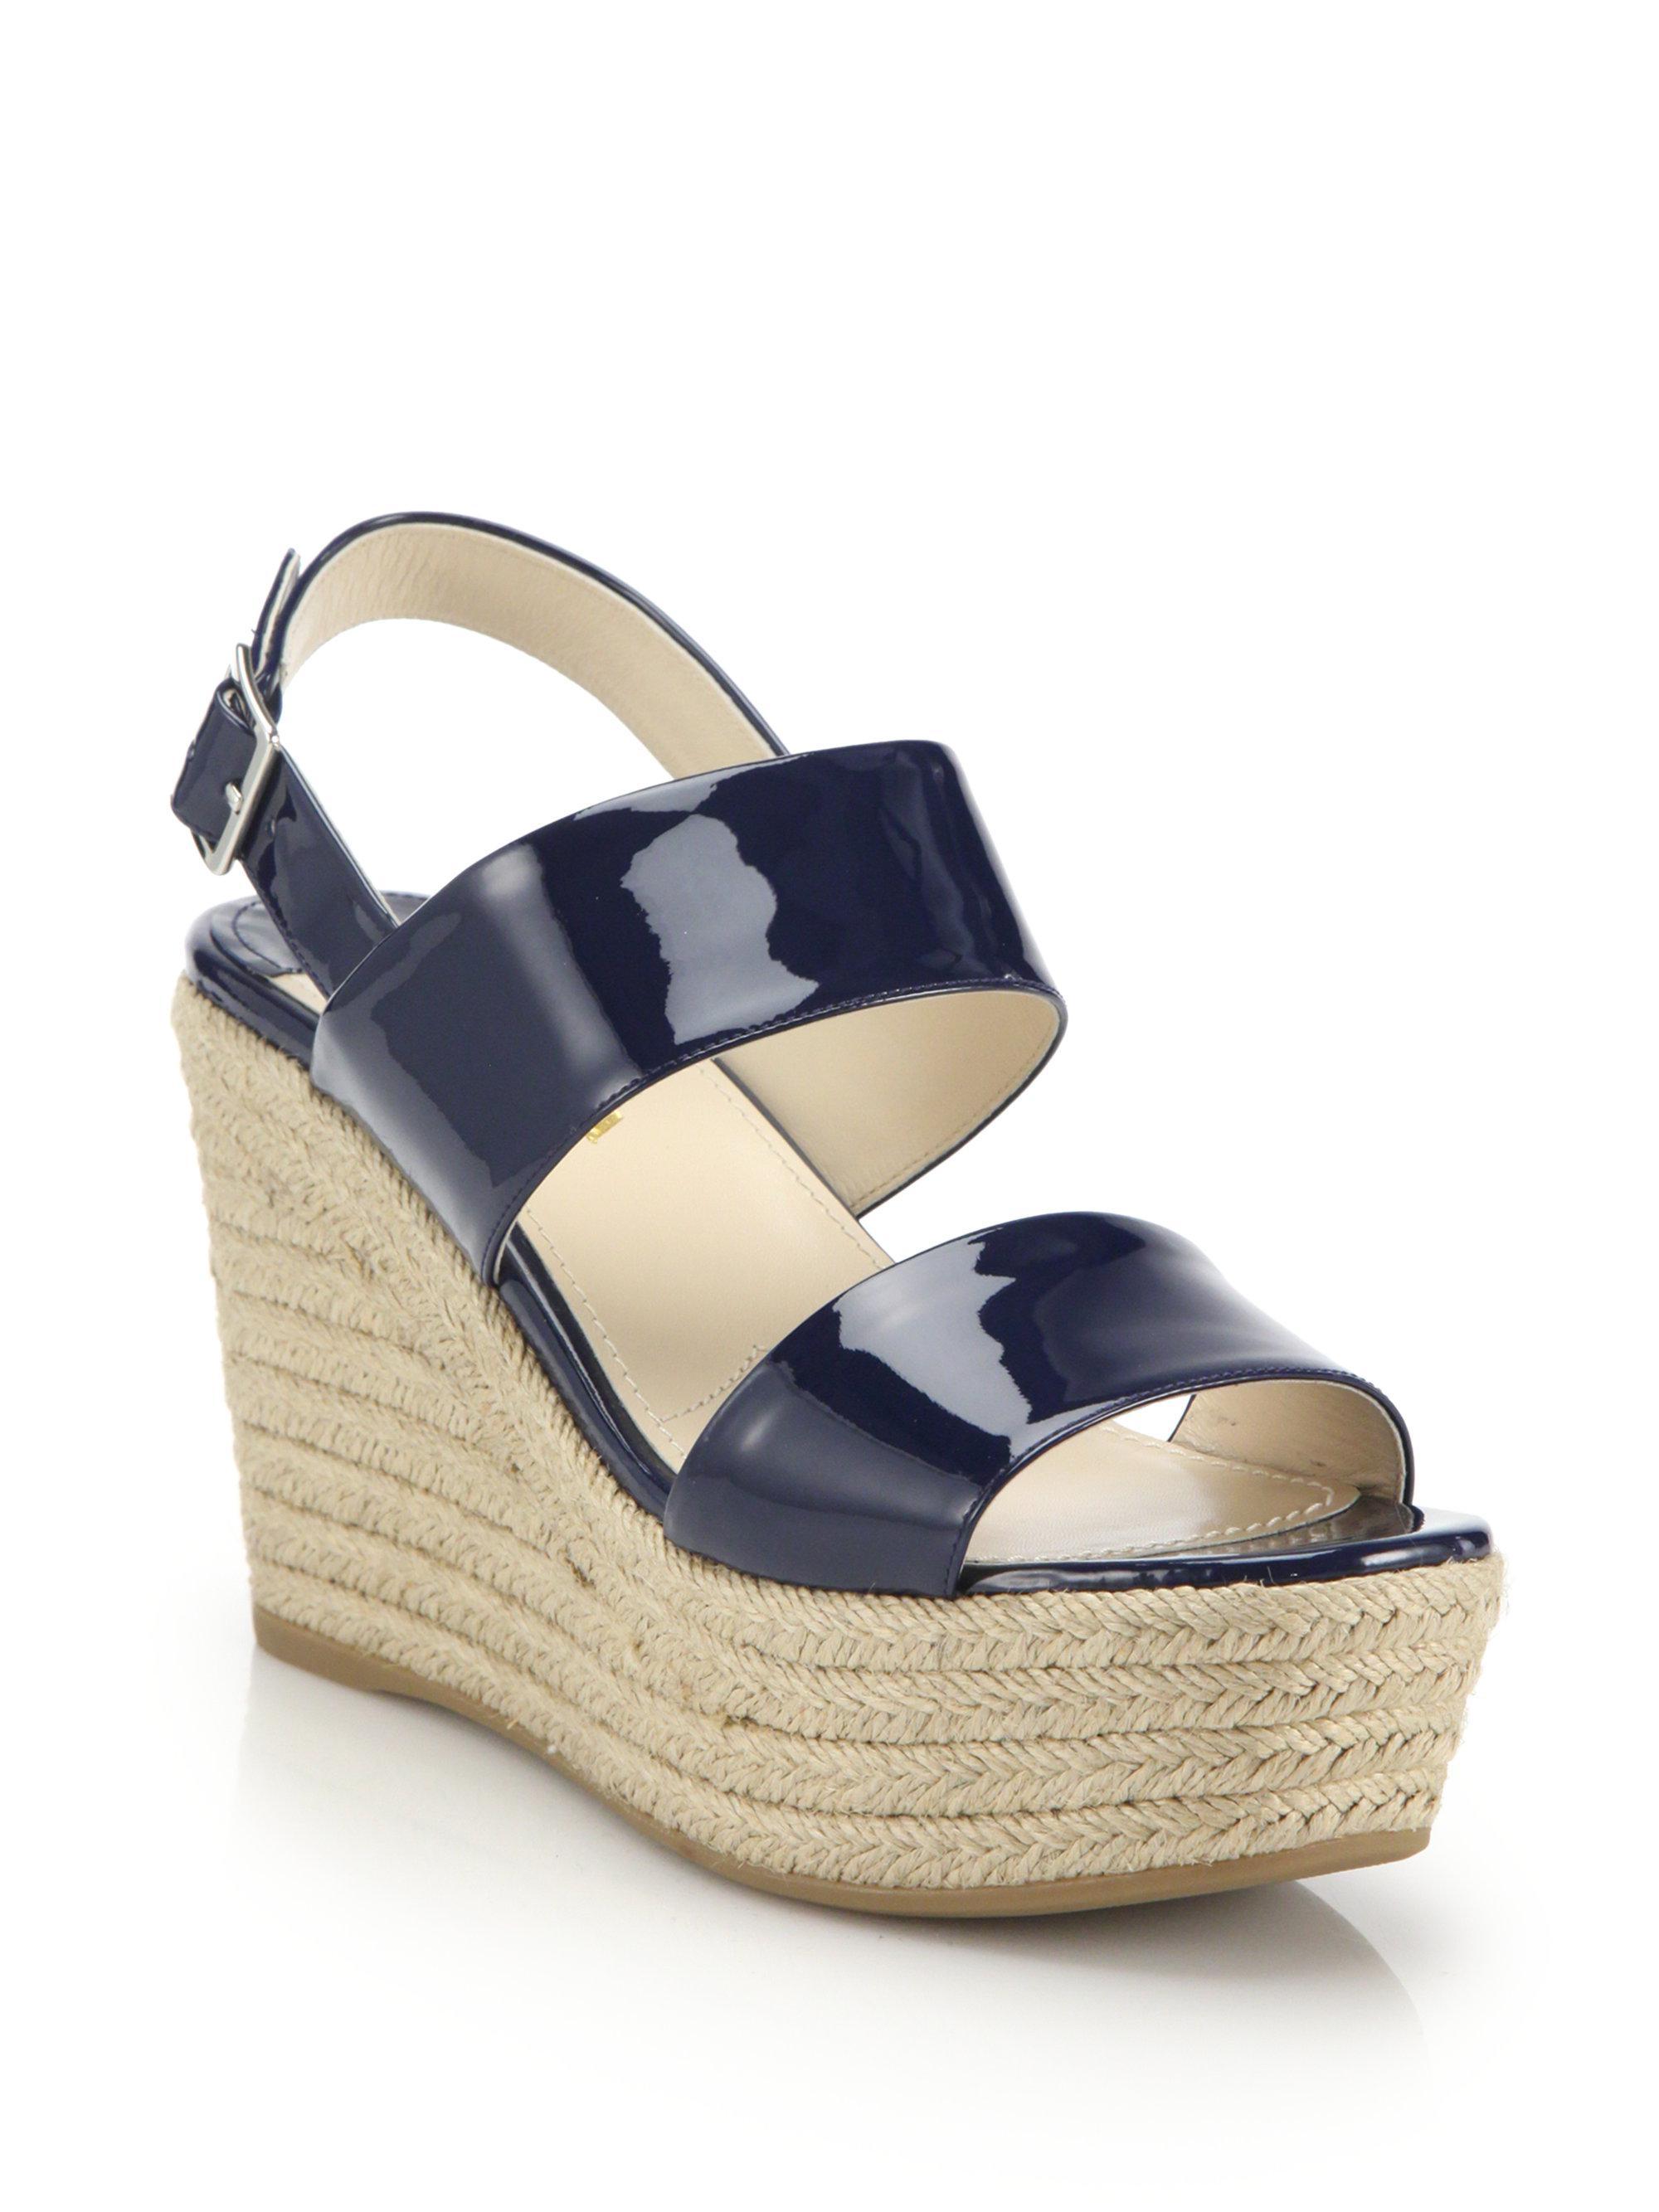 65cc5f8fbda3 Lyst - Prada Patent Leather Espadrille Platform Wedge Sandals in Blue